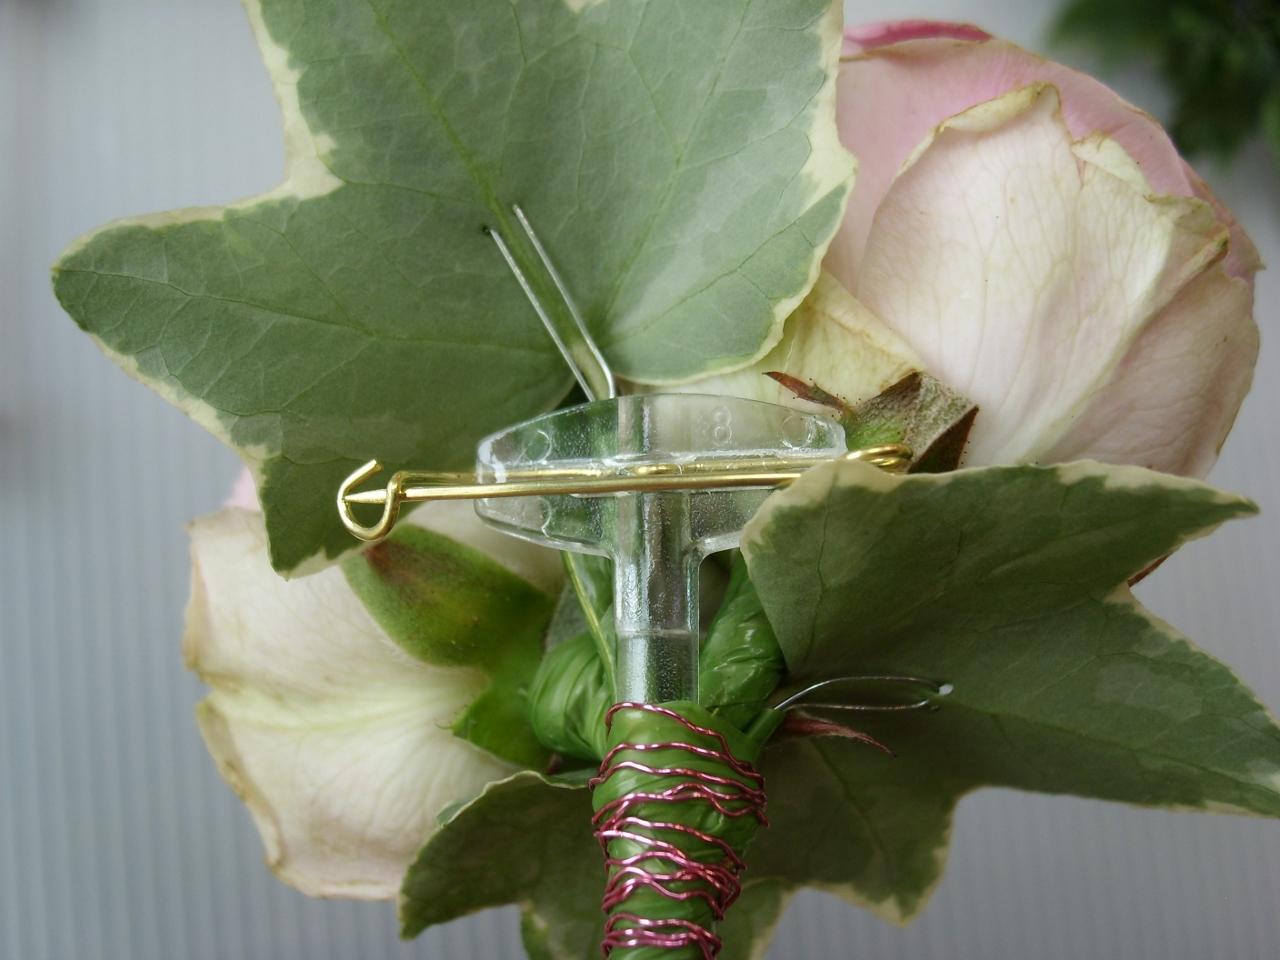 How To Make Wedding Buttonholes: Buttonholes & Corsages